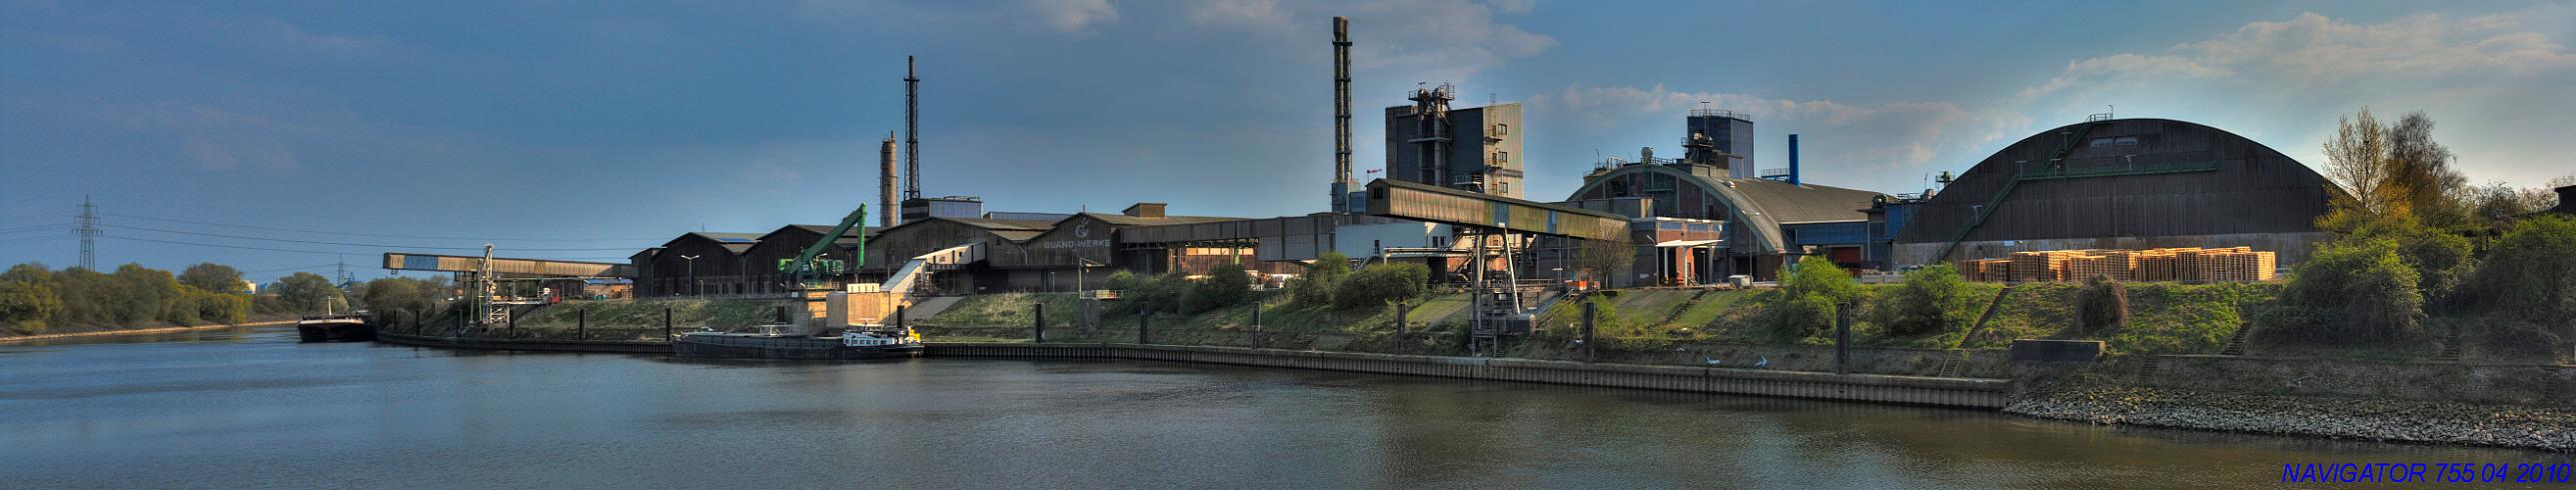 Rheinhafen - Krefeld - Uerdingen II / HDR - Pano, Bitte scrollen!